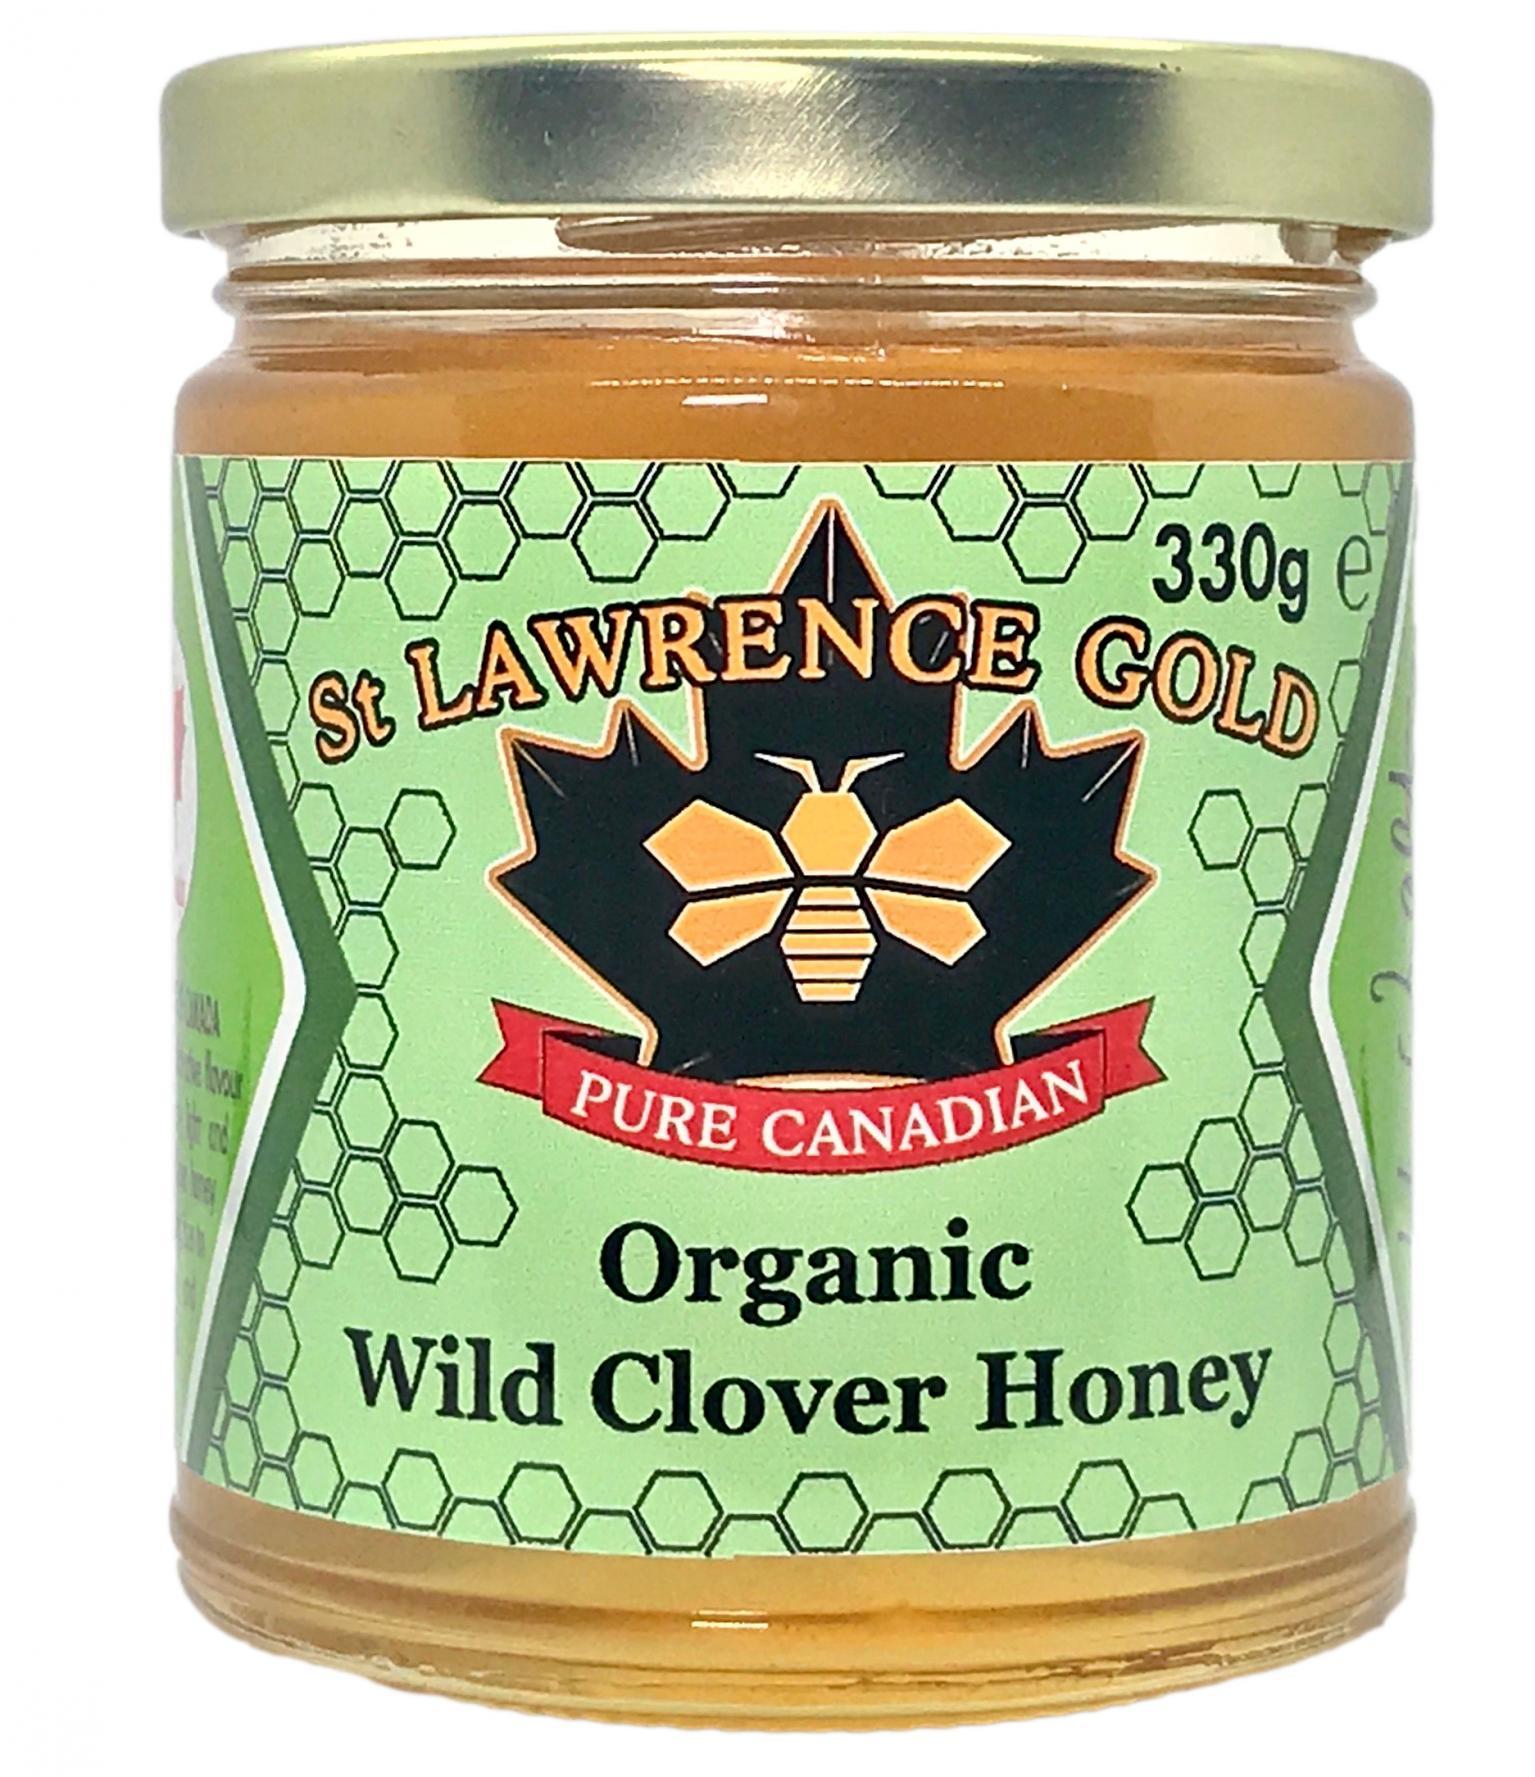 Pure Canadian - Organic Wild Clover Honey 330g